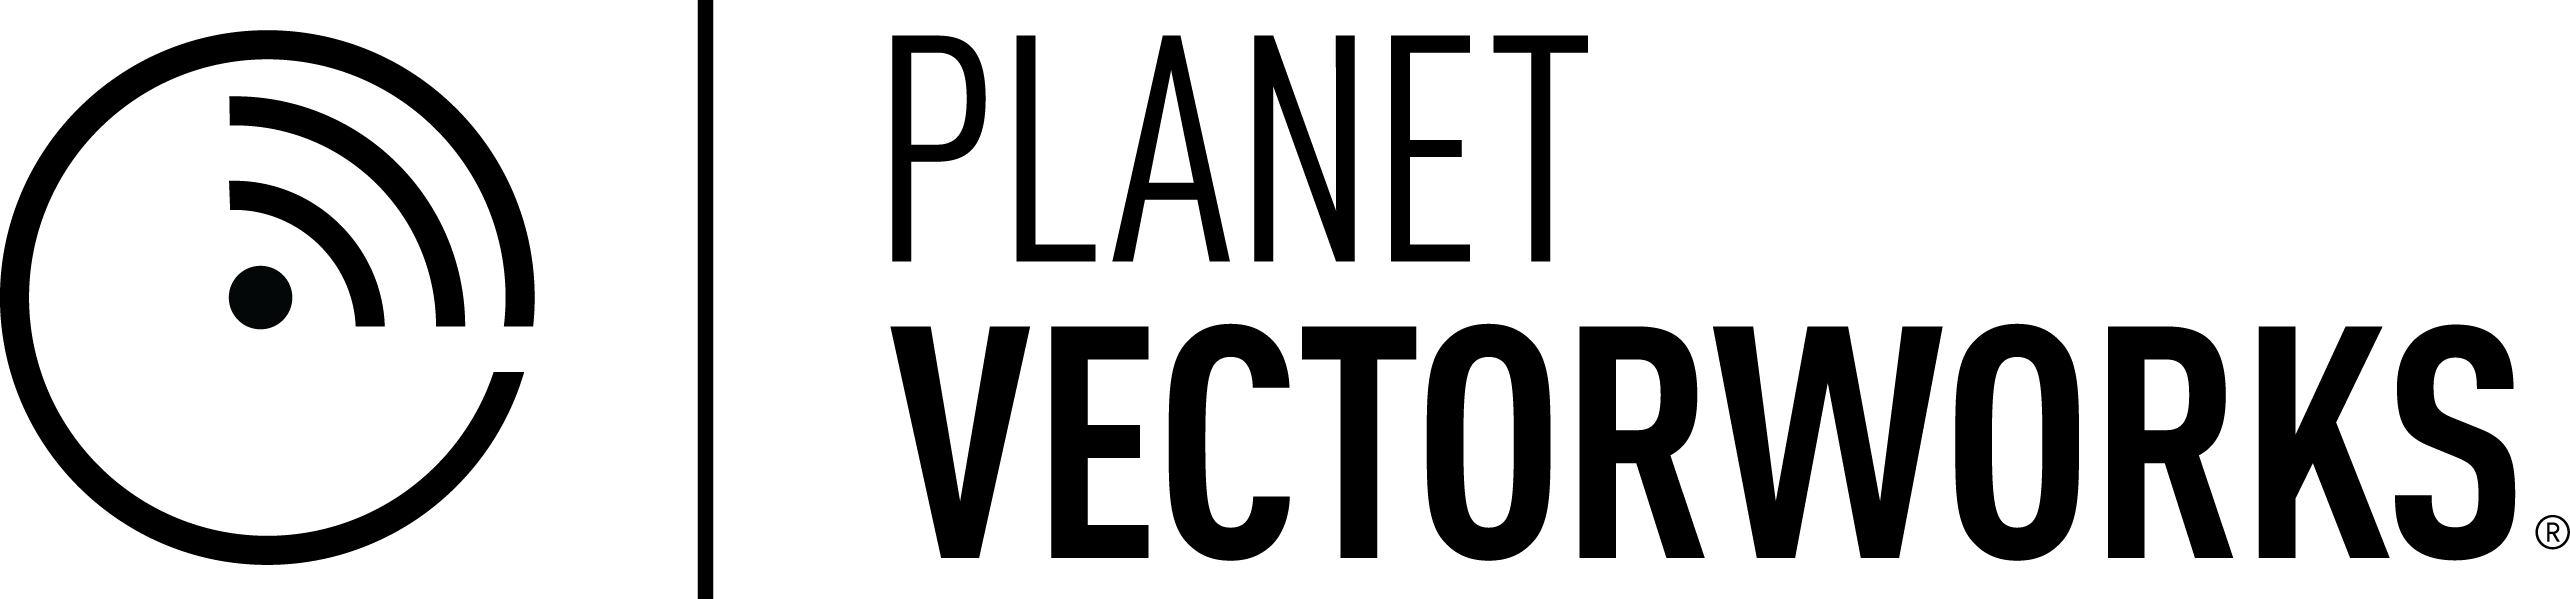 planet_vectorworks_logotype_black.png